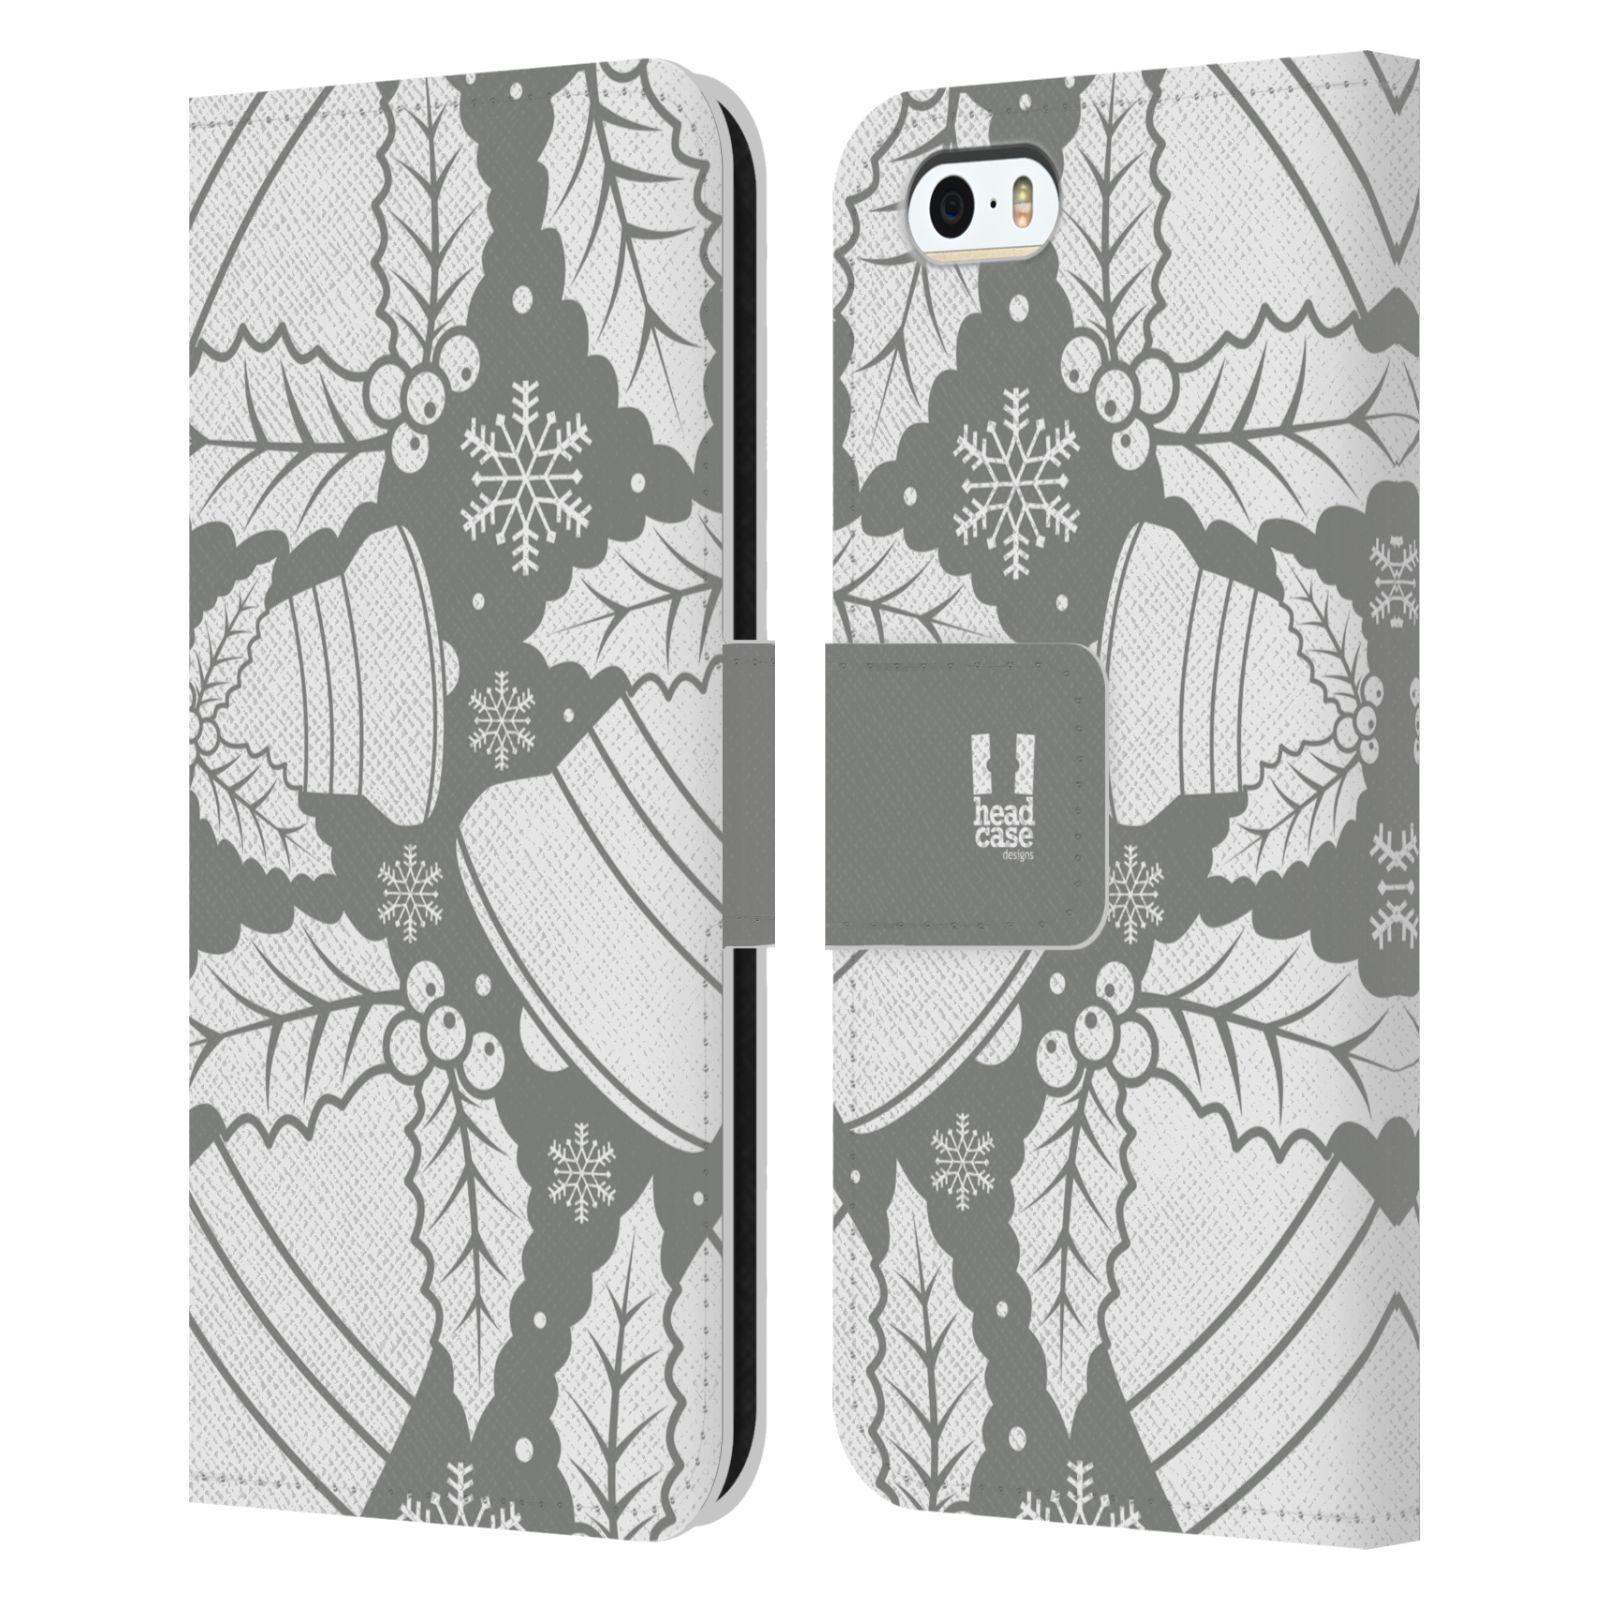 HEAD CASE Flipové pouzdro pro mobil Apple Iphone 5/5s stříbrné vzory zvonečky